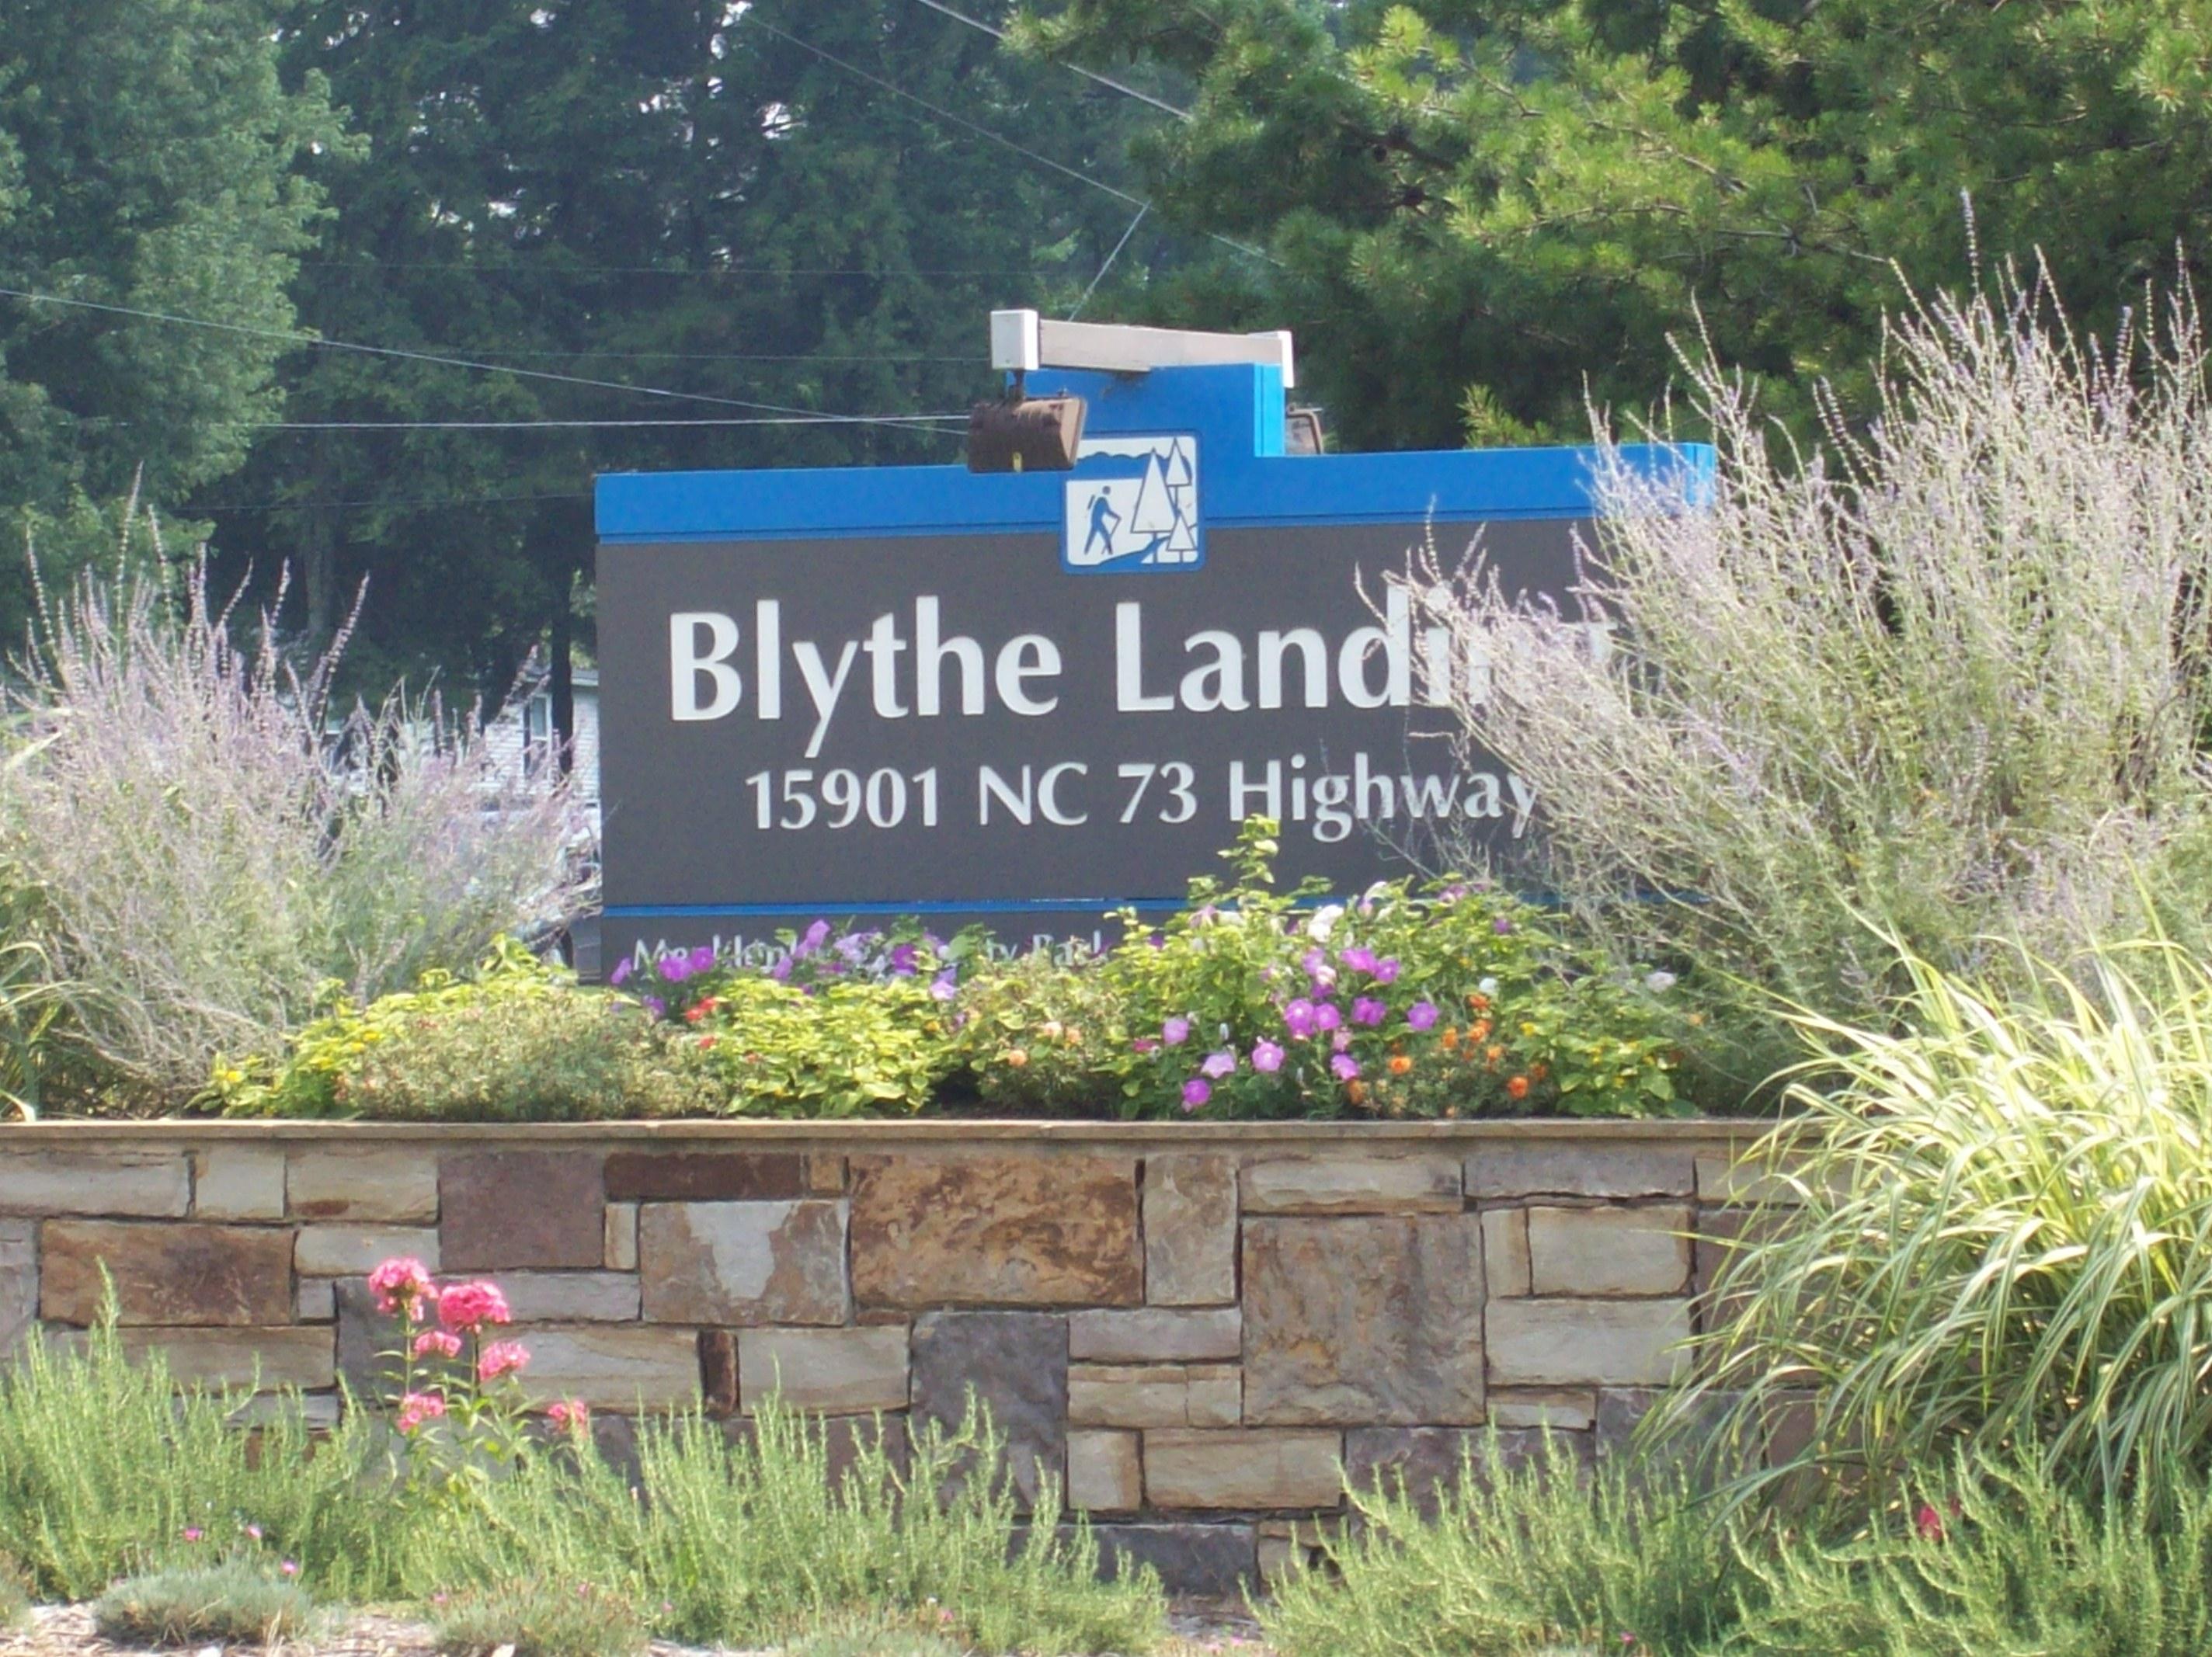 Lake Norman Park Blythe Landing